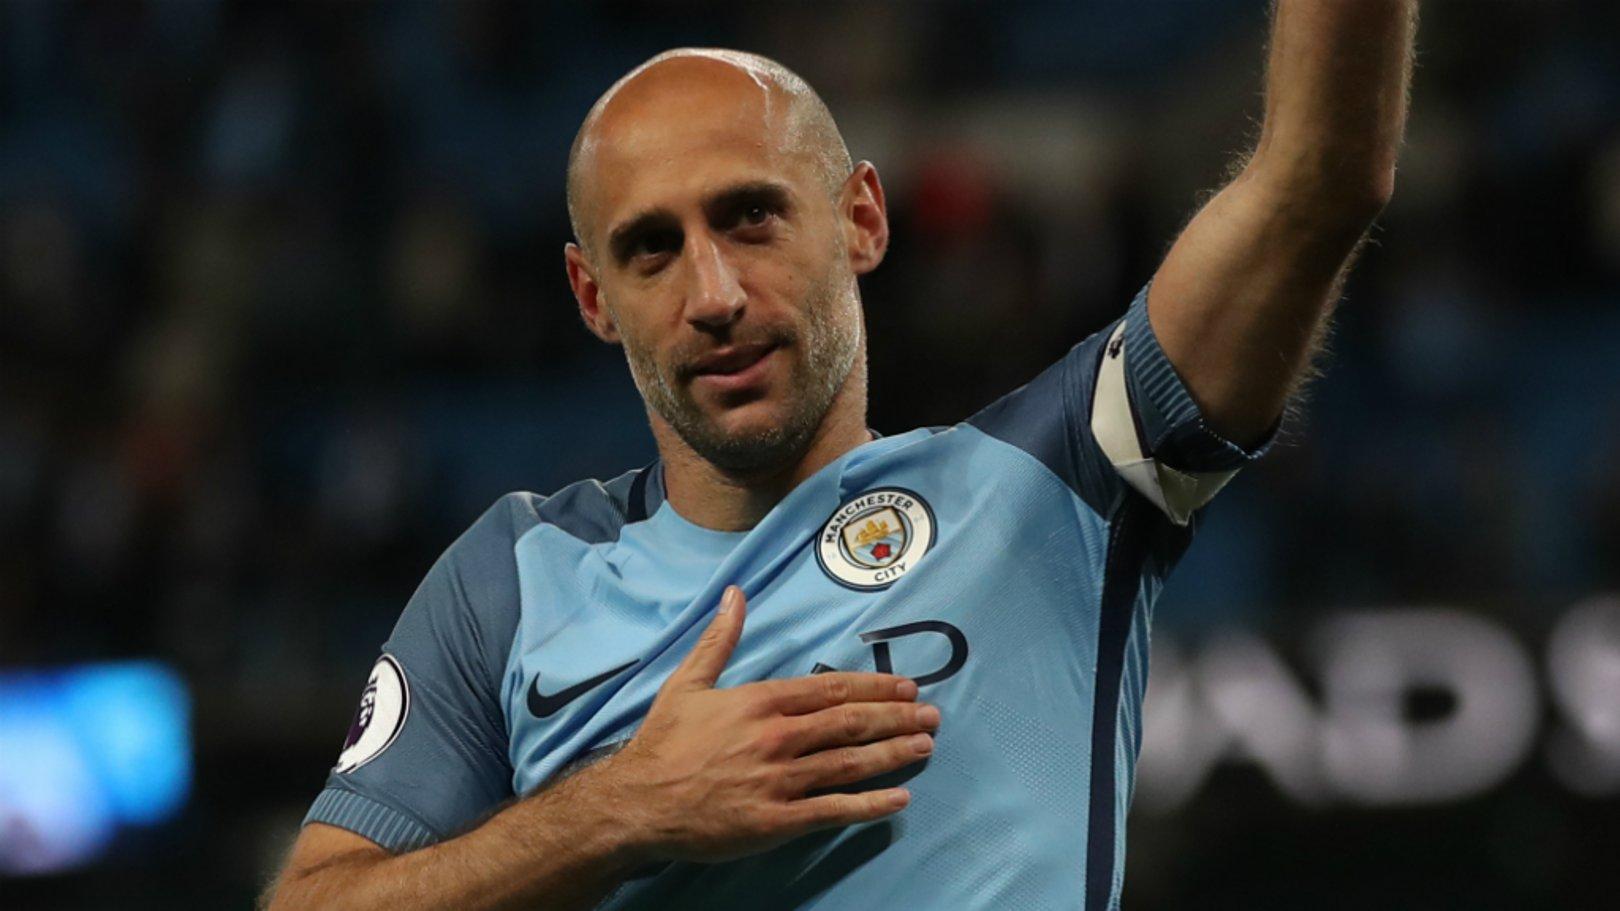 LIONHEART: Pablo Zabaleta bids farewell to the City fans